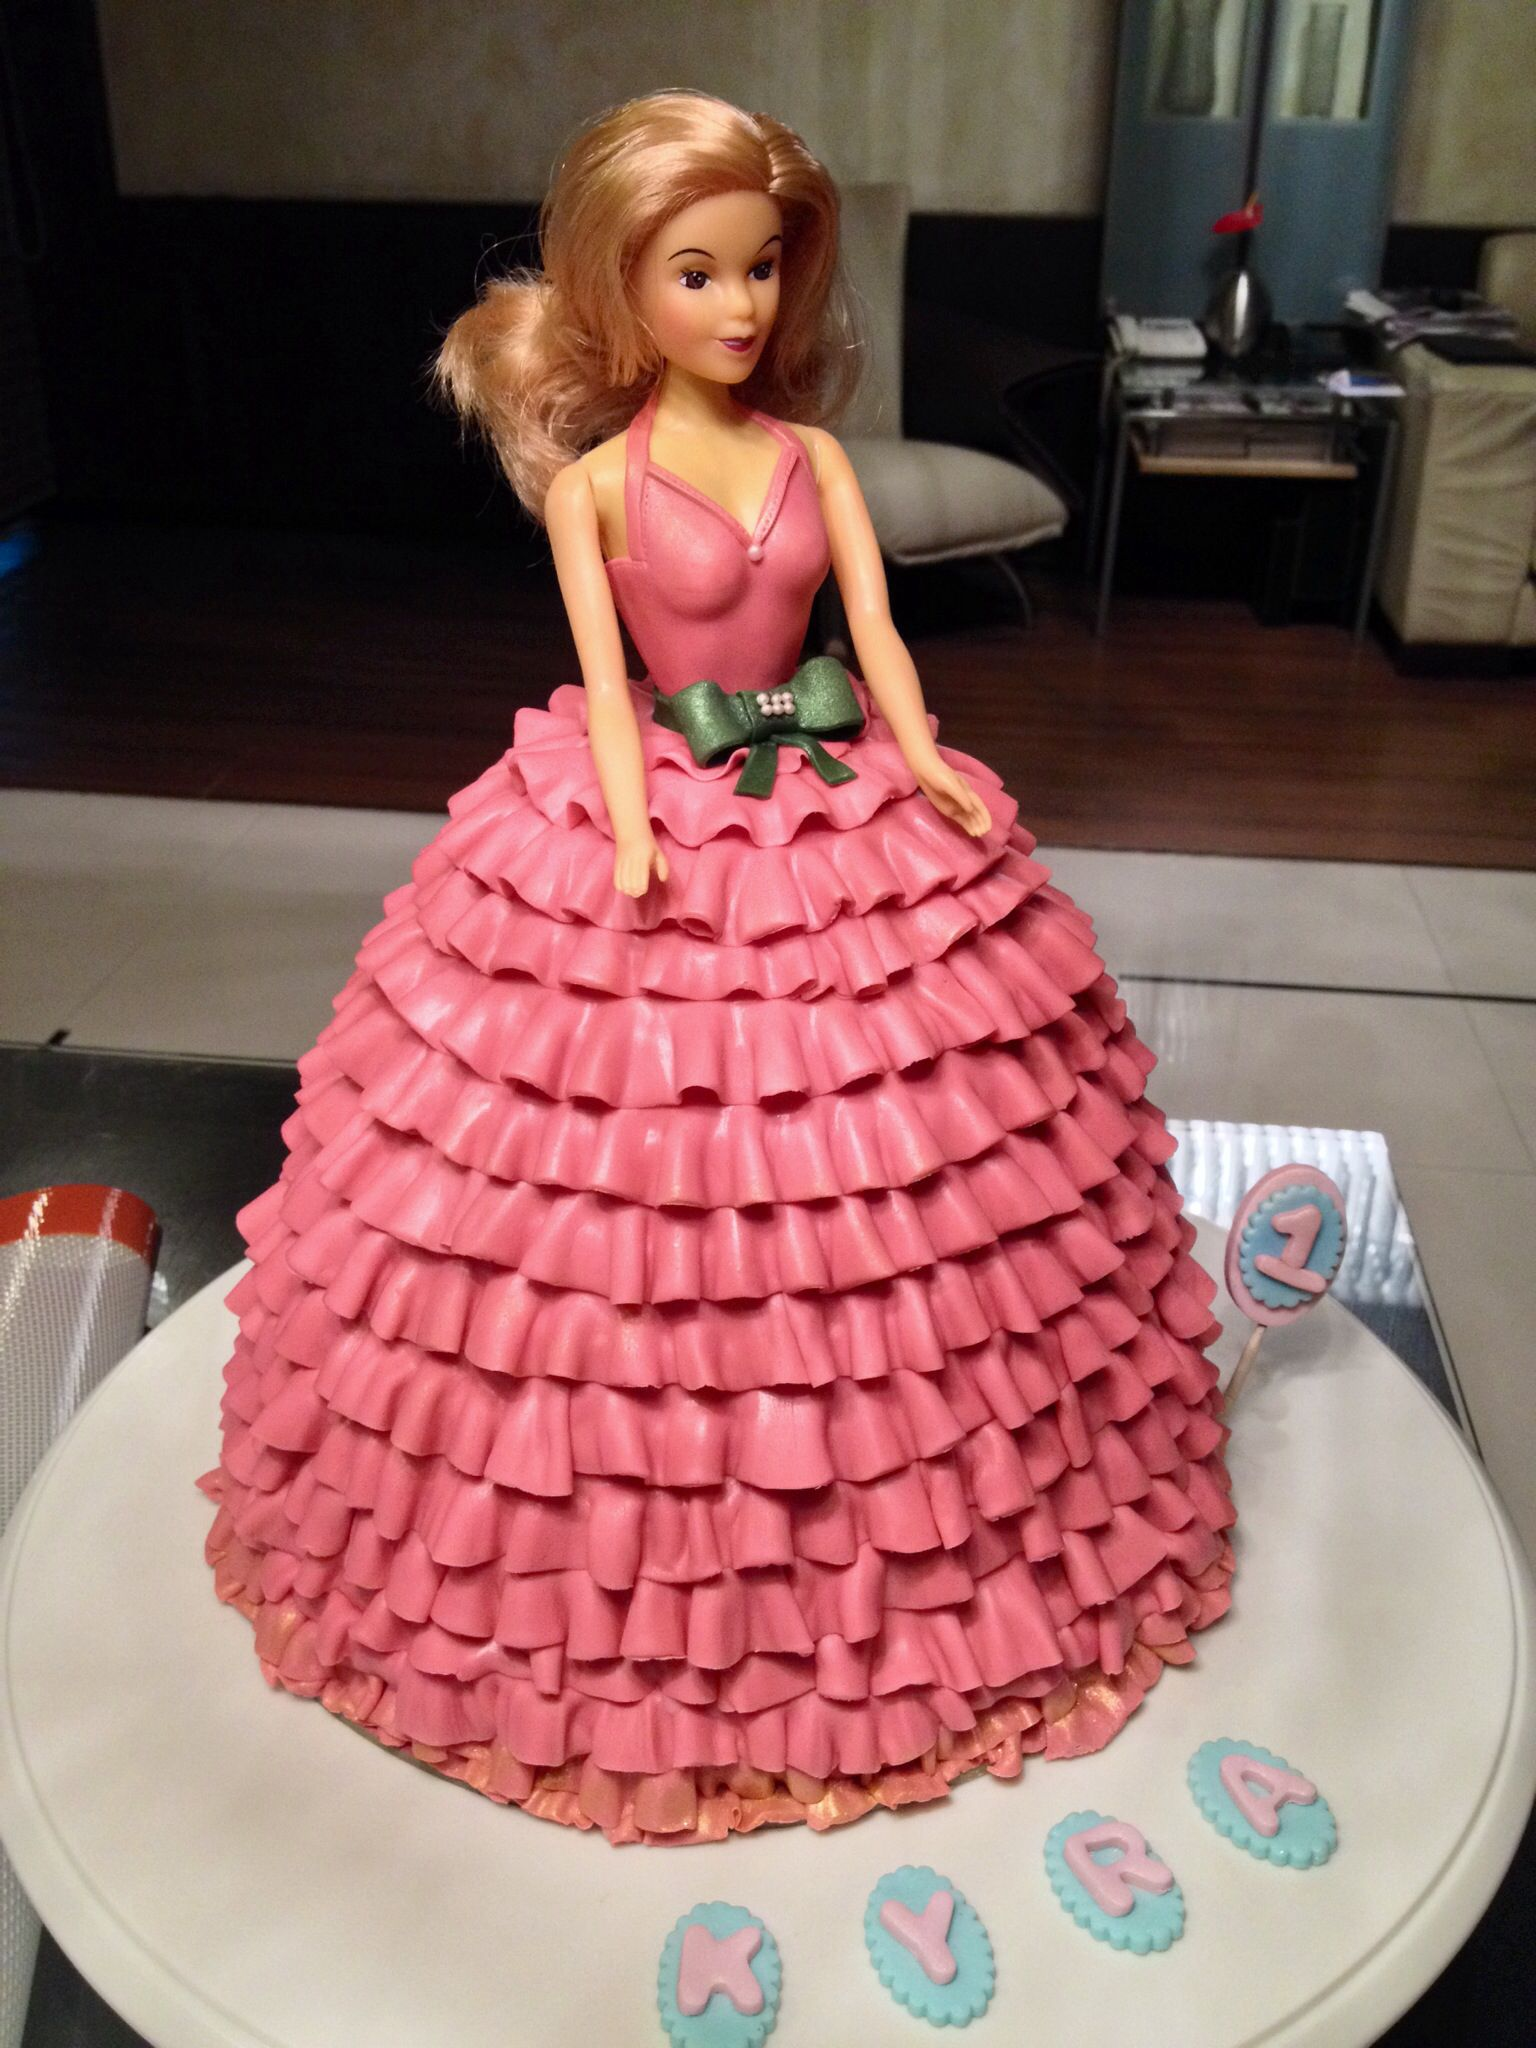 Doll Cake 7 Layered Chocolate Cake With Fondant Ruffles With